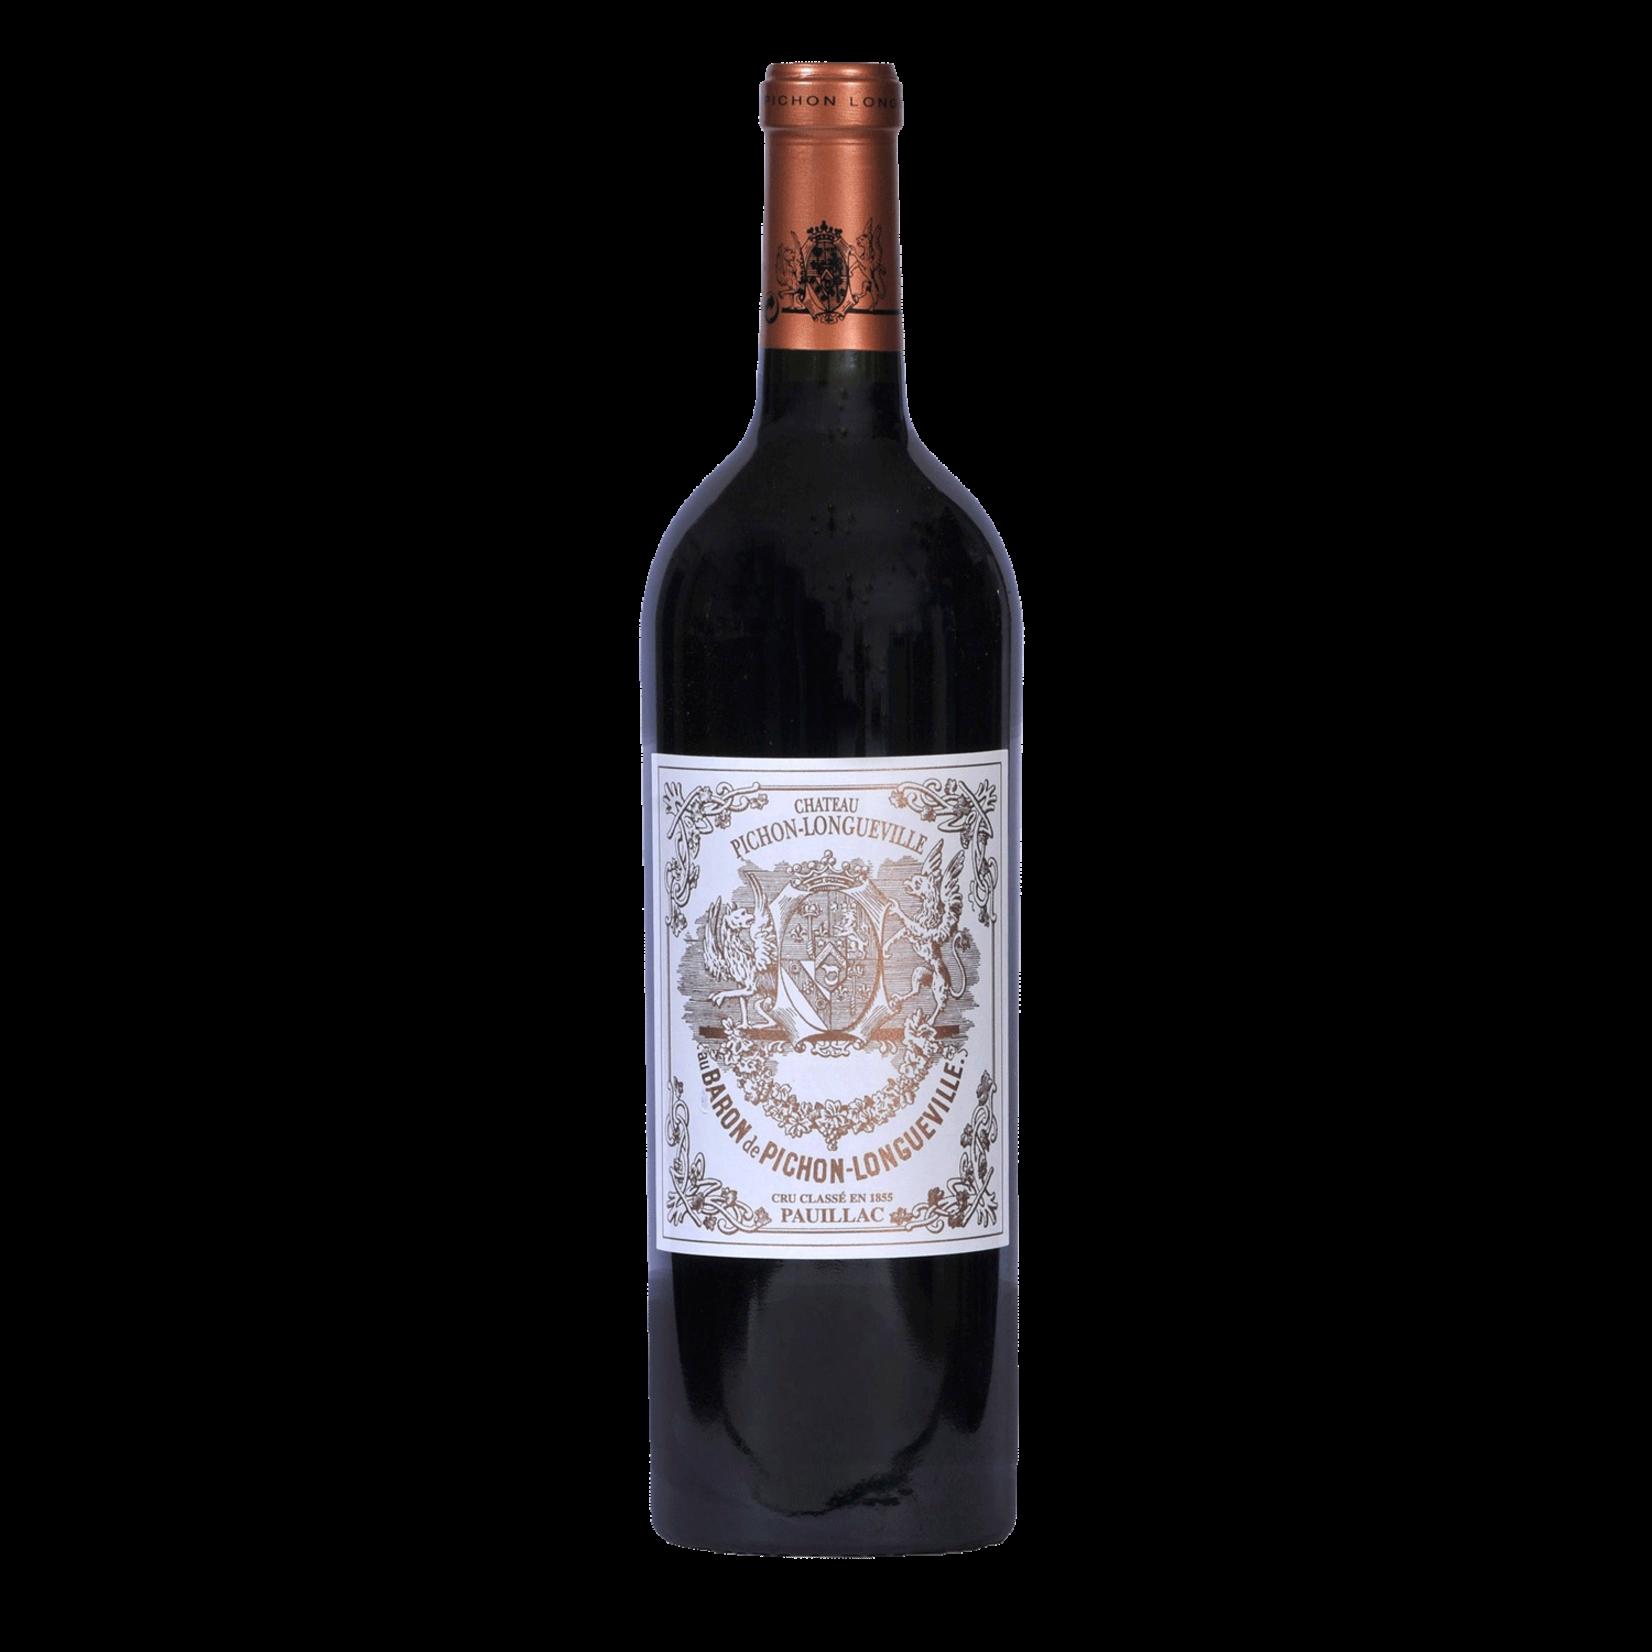 Wine Chateau Pichon Longueville Baron 2006 15L